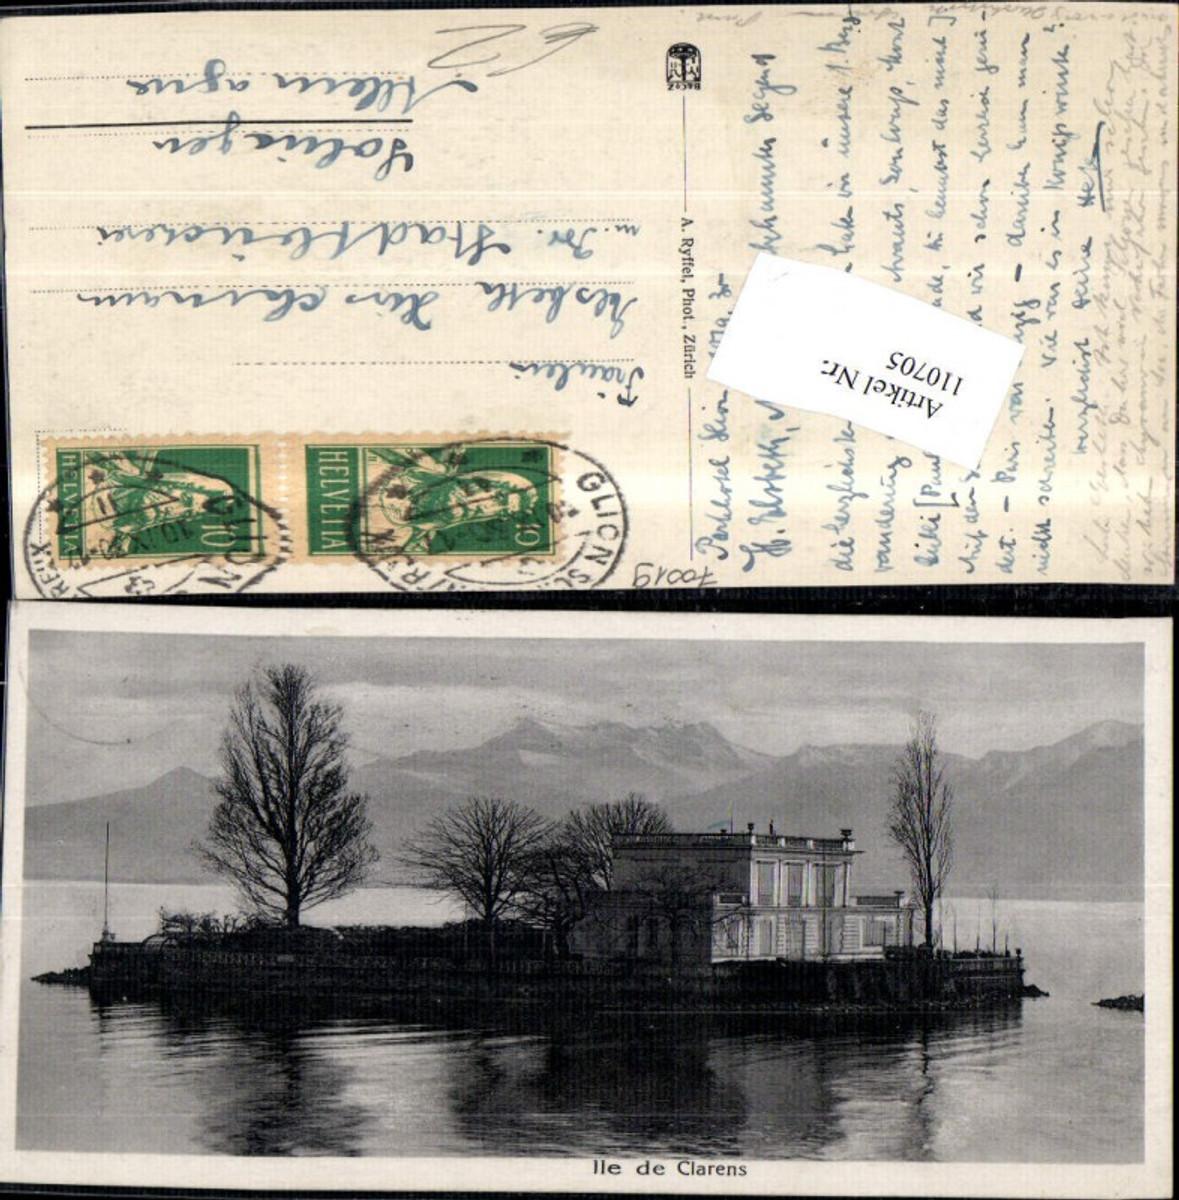 110705,Ile de Clarens 1930 Kanton Waadt günstig online kaufen